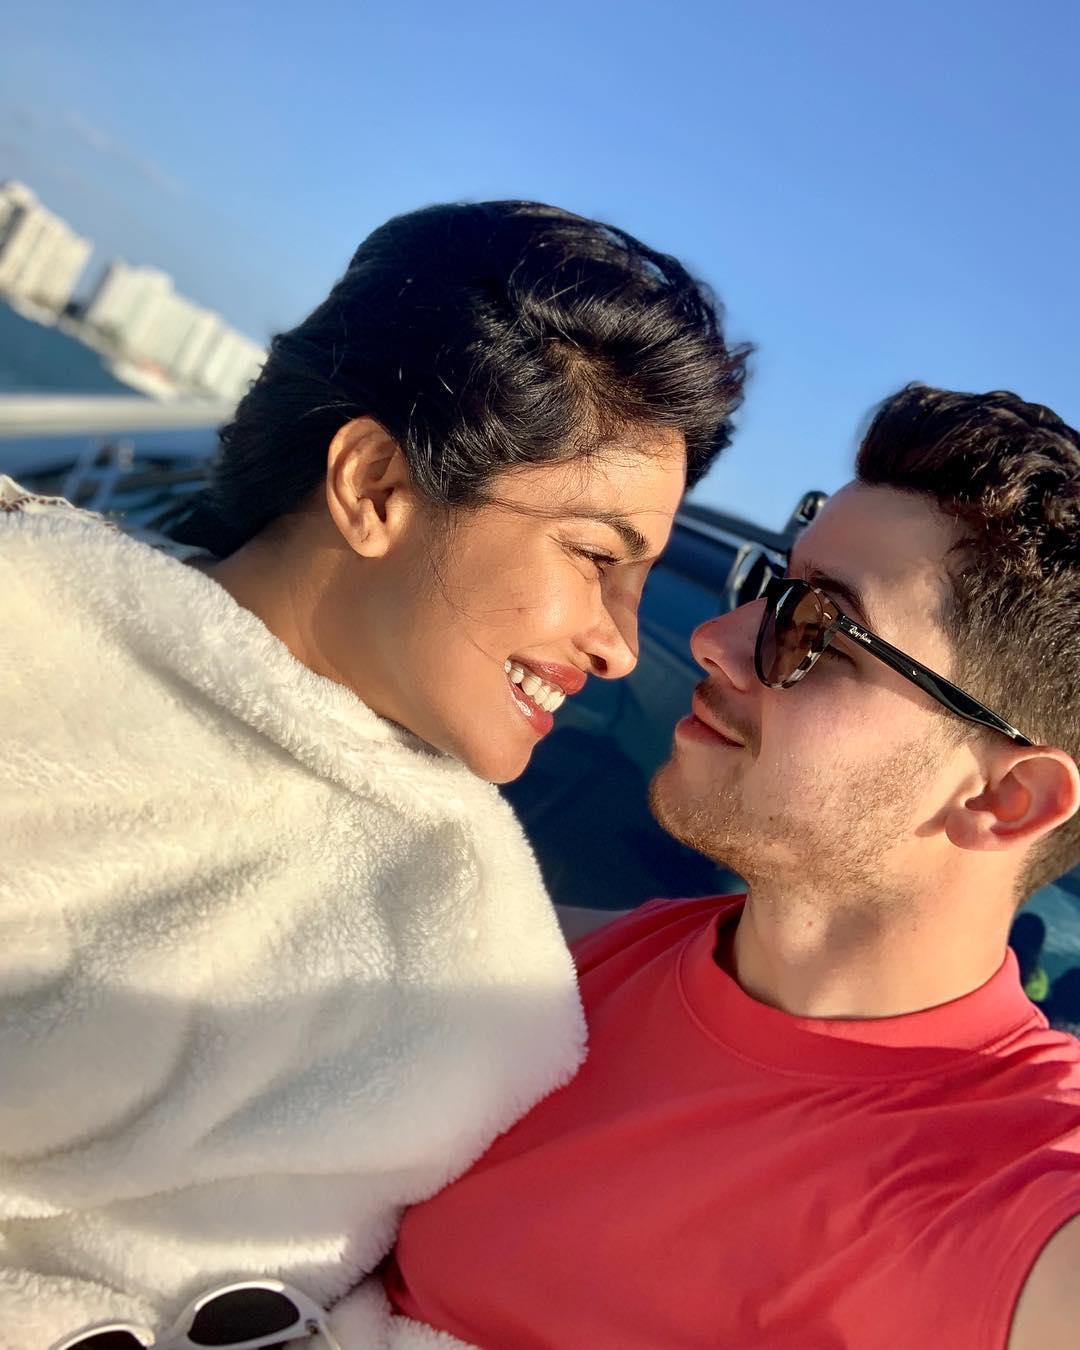 Another Day, Another Beautiful Photo of Priyanka Chopra & Nick Jonas ❤️